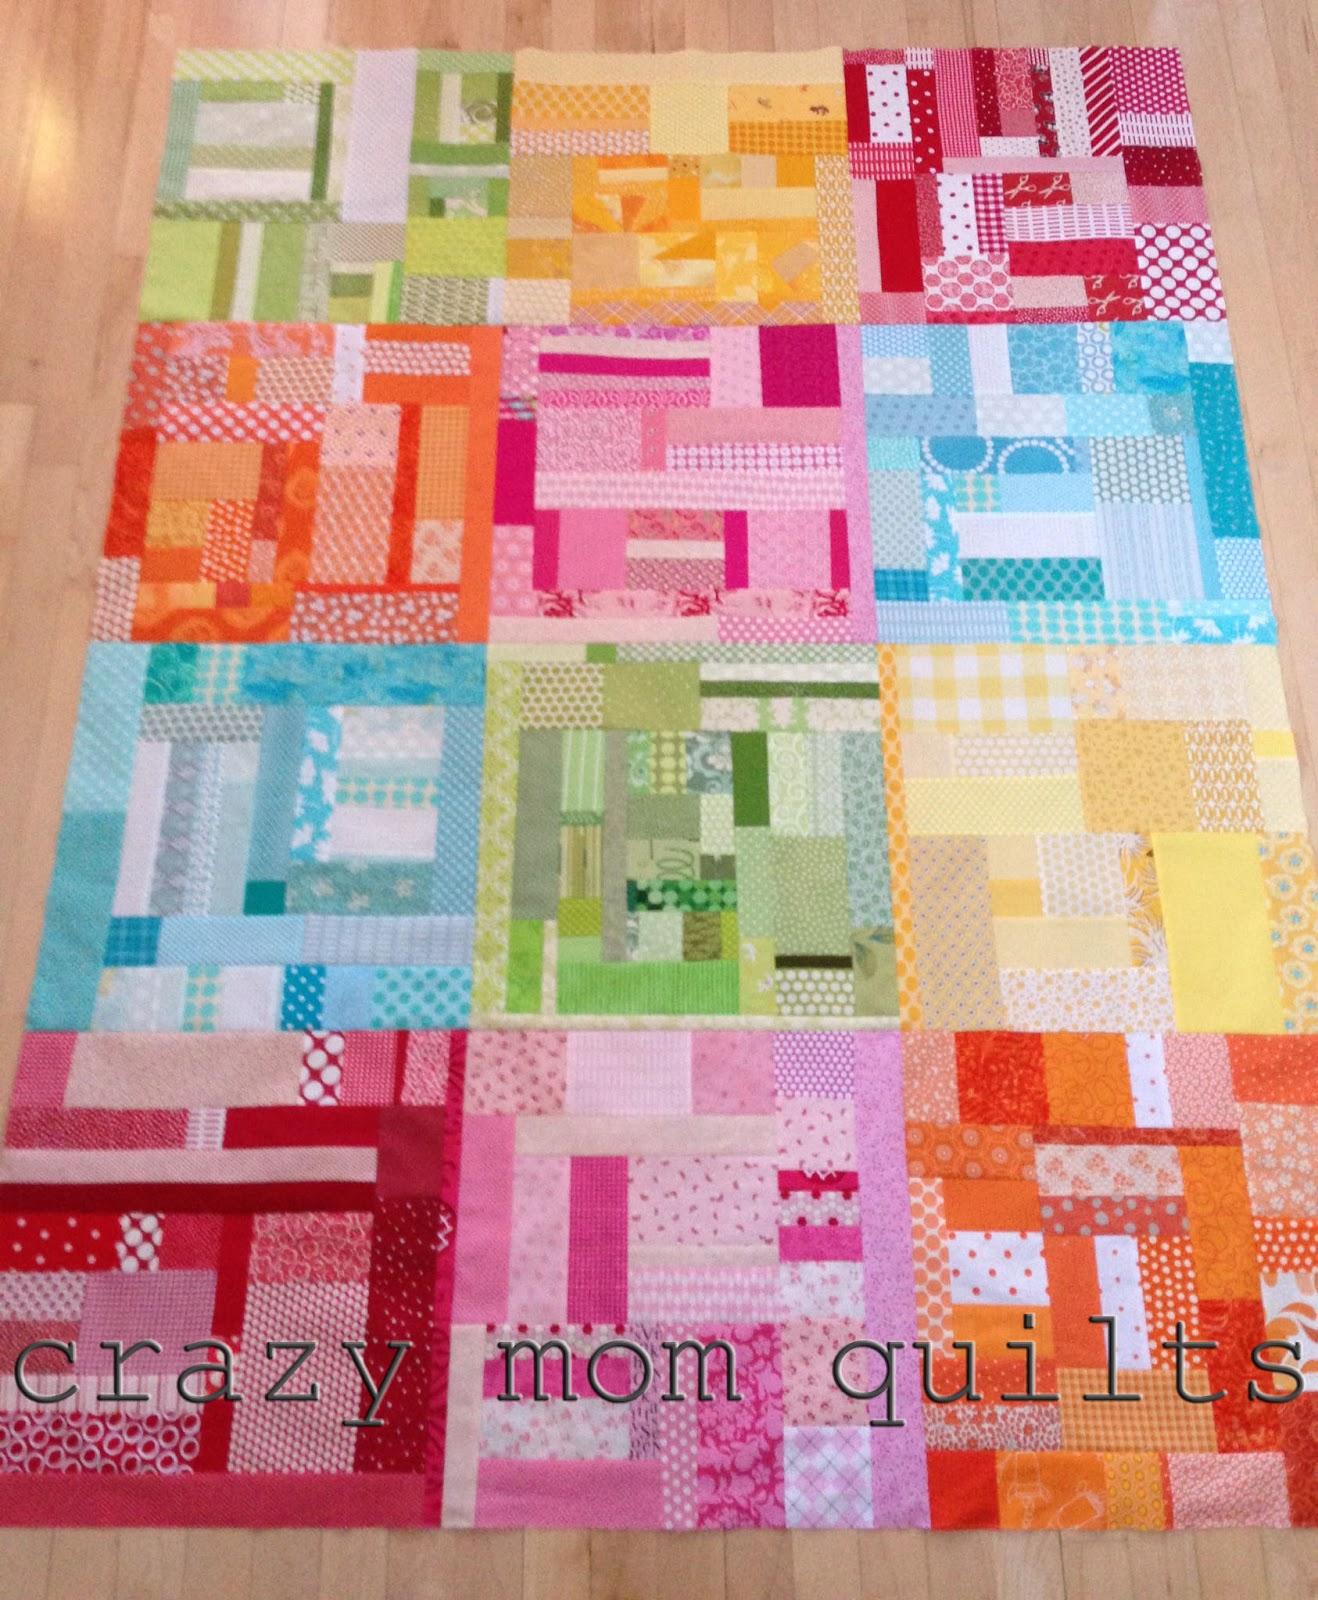 crazy mom quilts: December 2012 : crazy mom quilts - Adamdwight.com